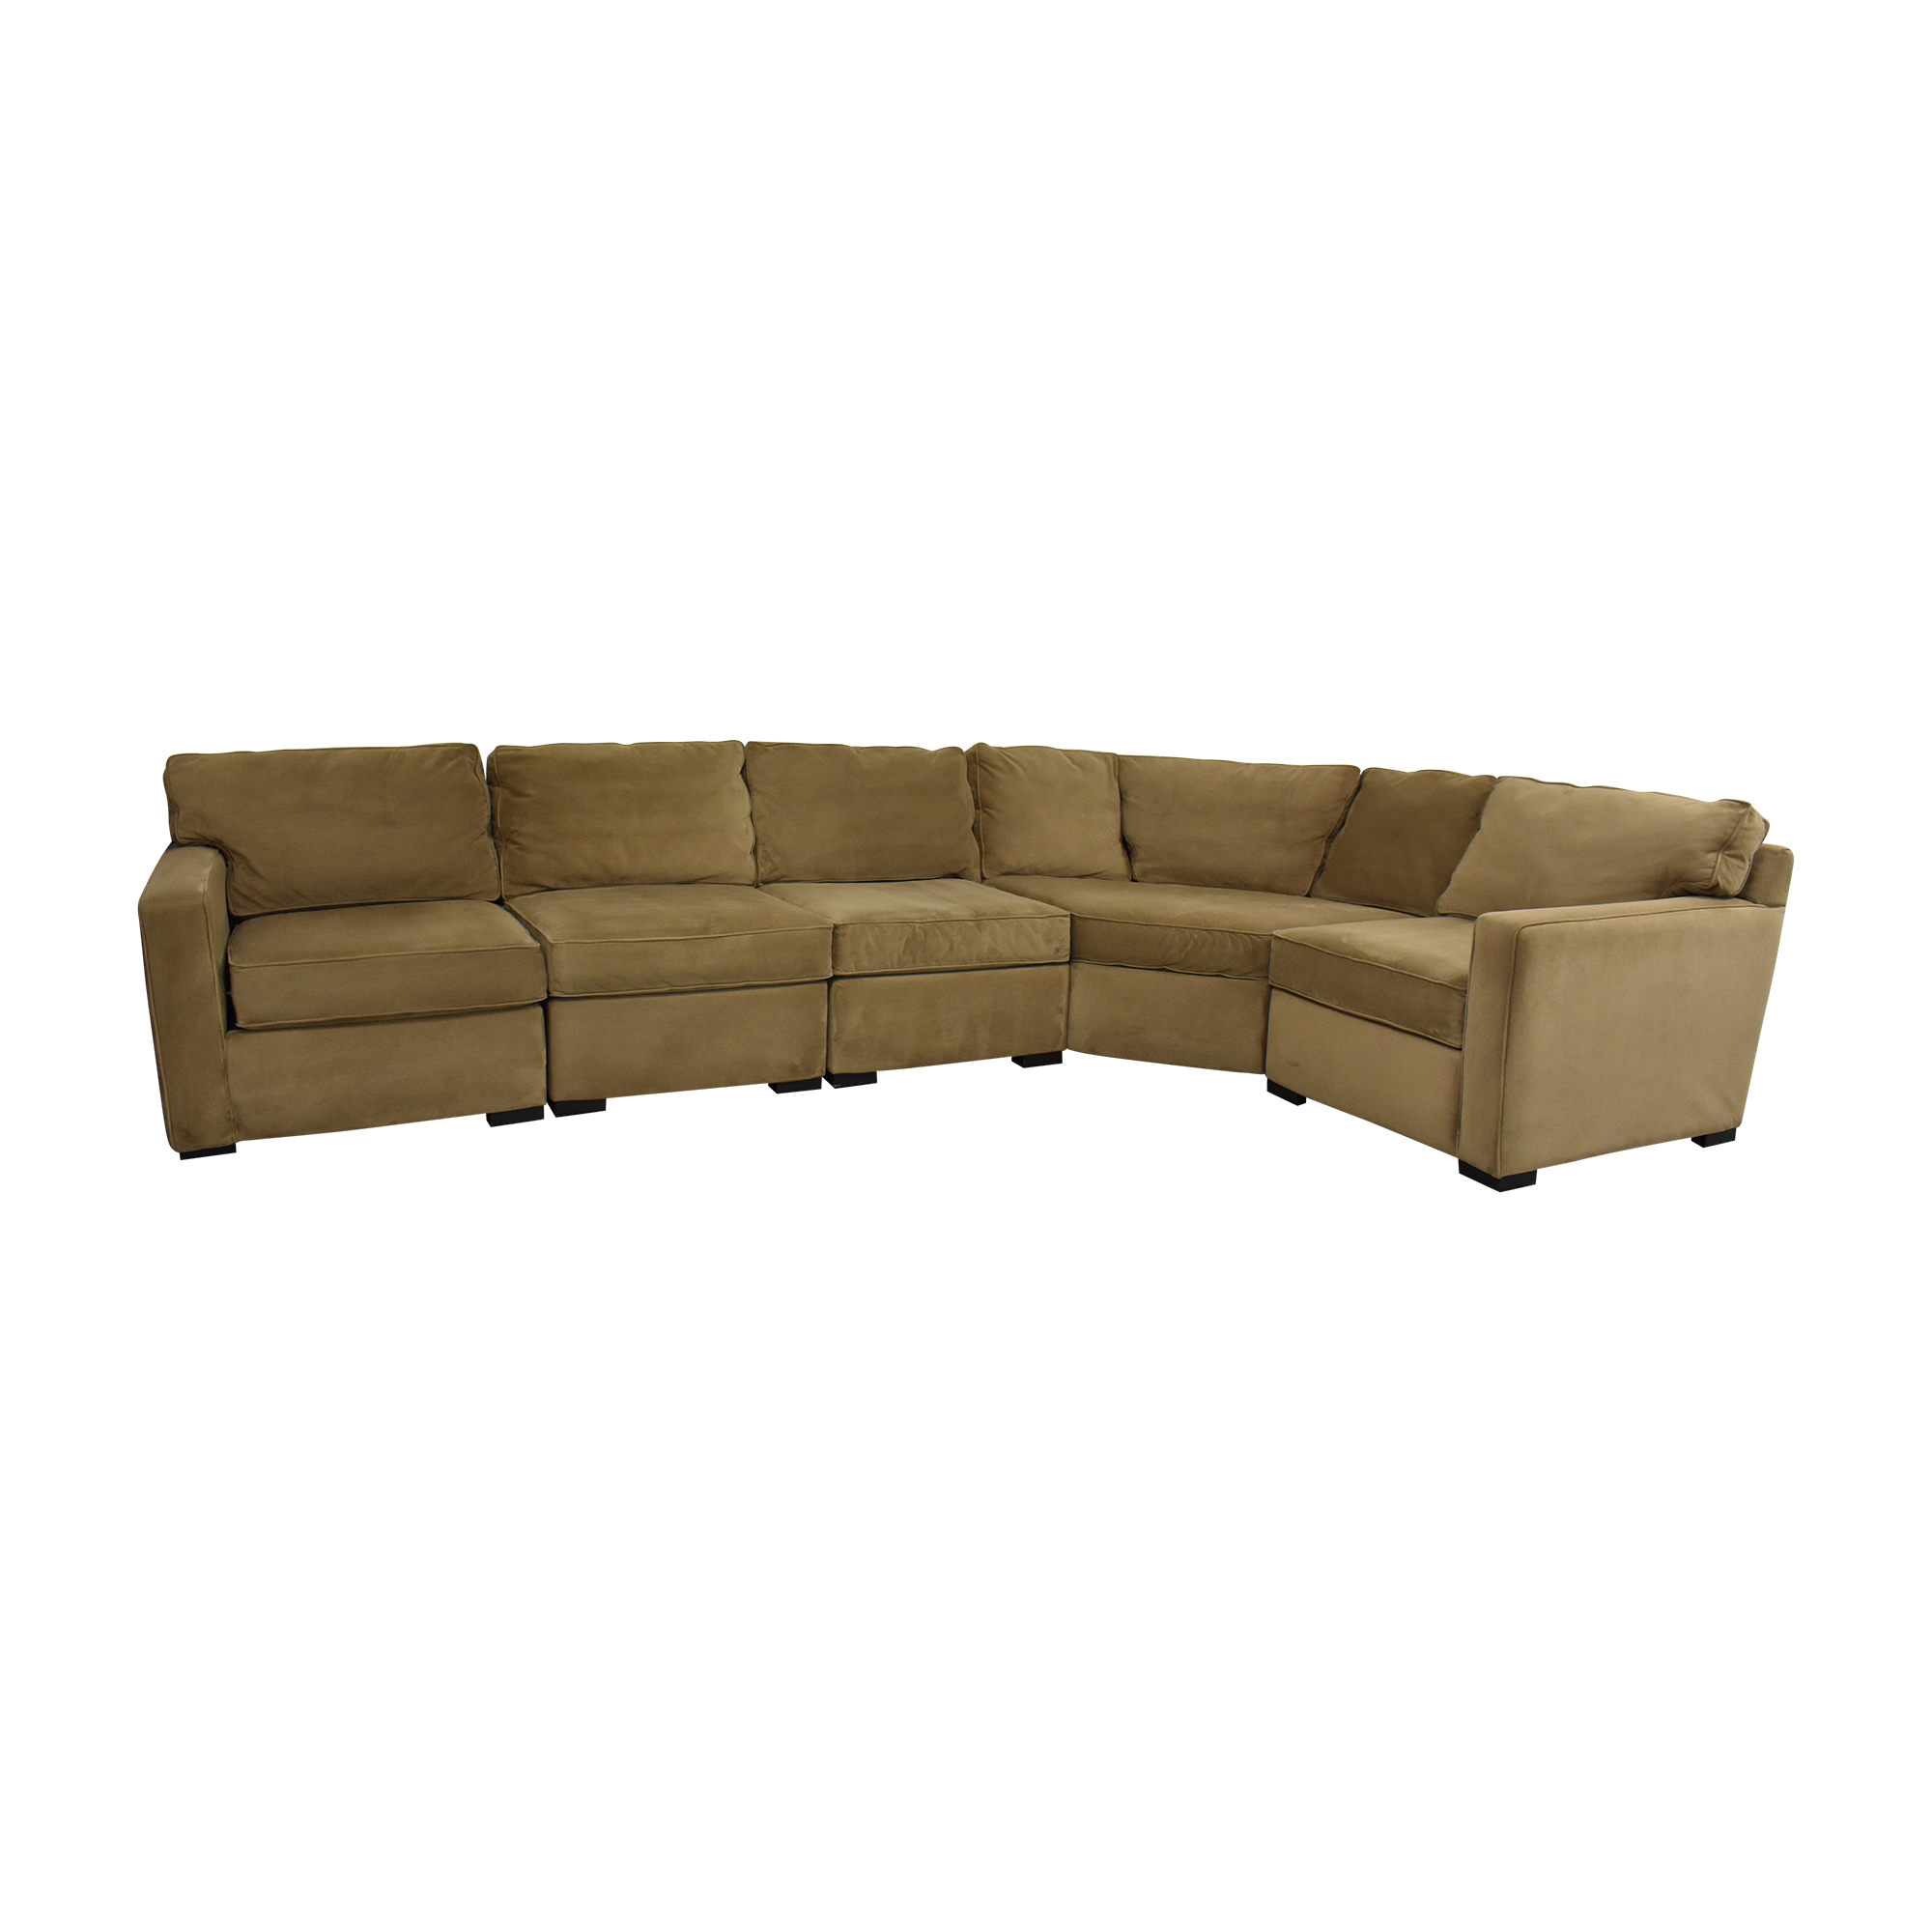 Macy's Macy's Jonathan Louis Corner Sectional Sofa Sofas